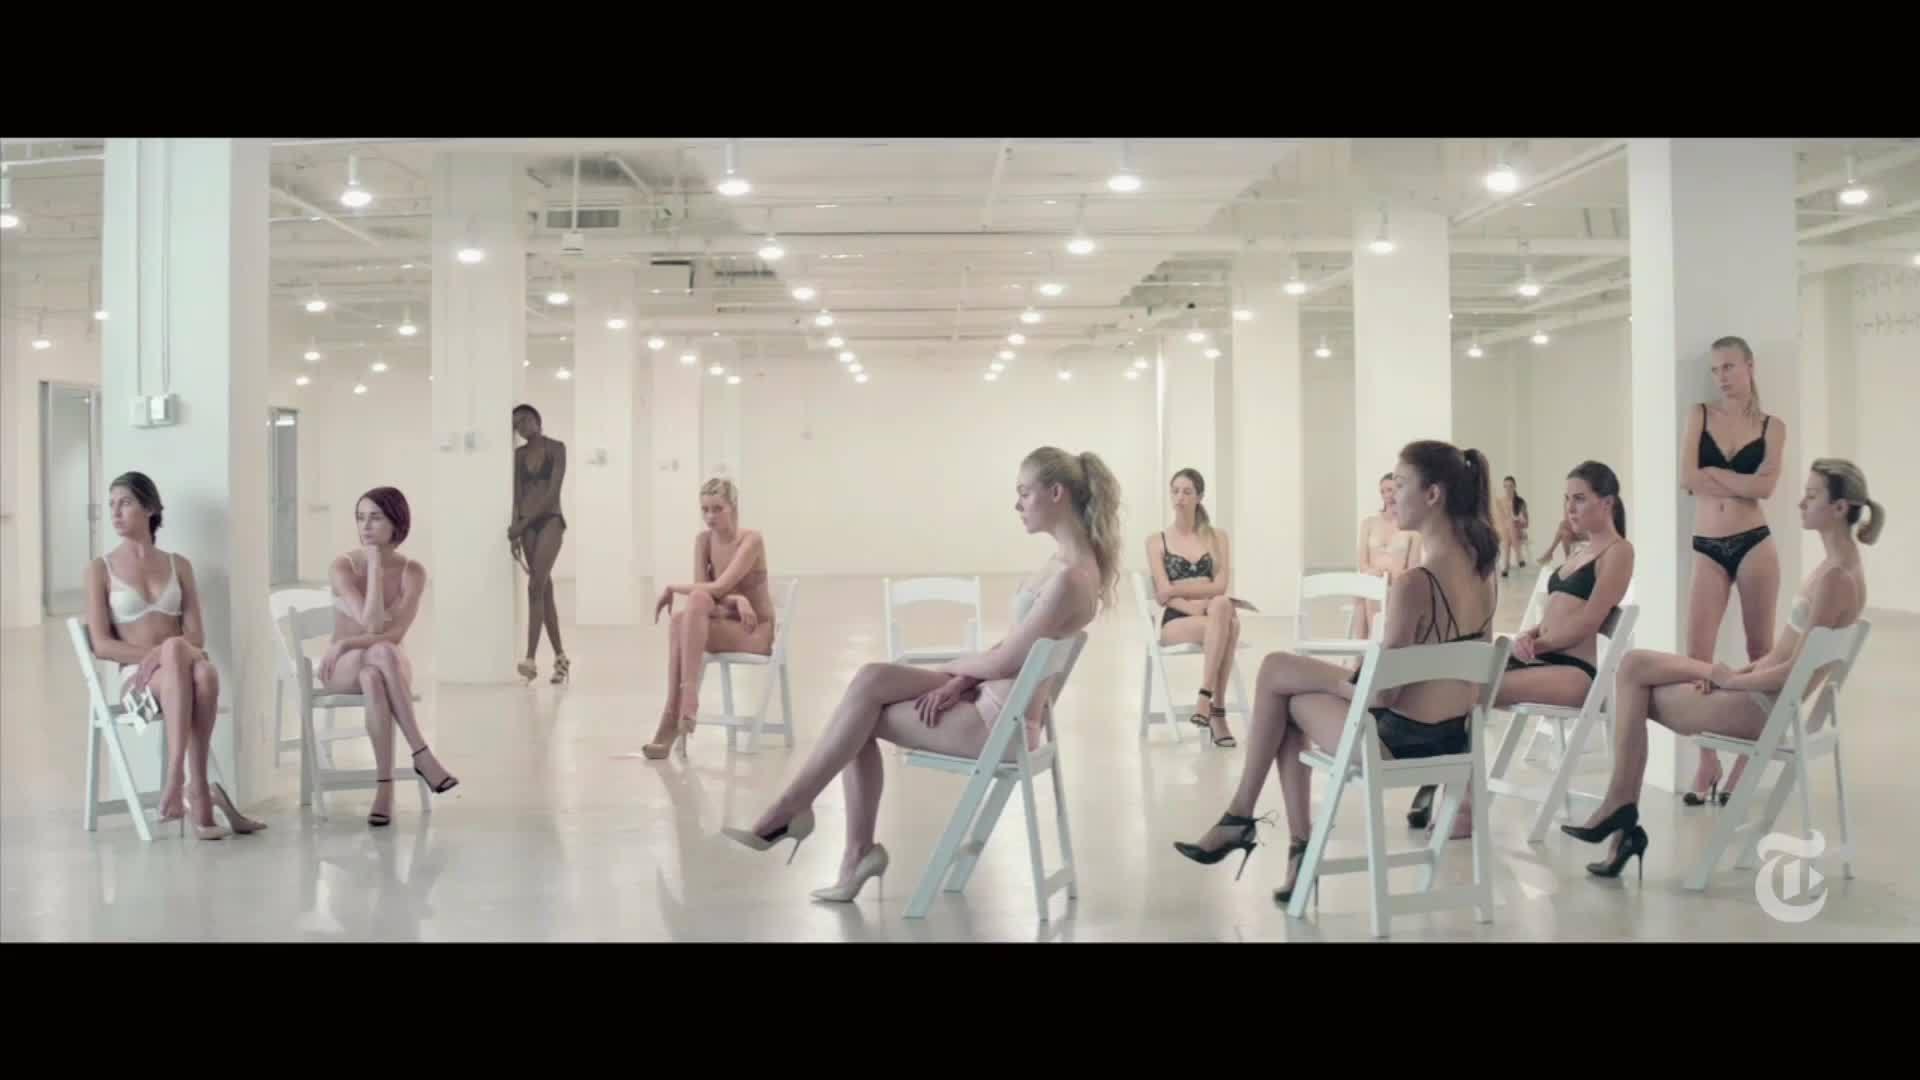 ElleFanning, ellefanning, Underwear audition scene from The Neon Demon [more inside] (reddit) GIFs